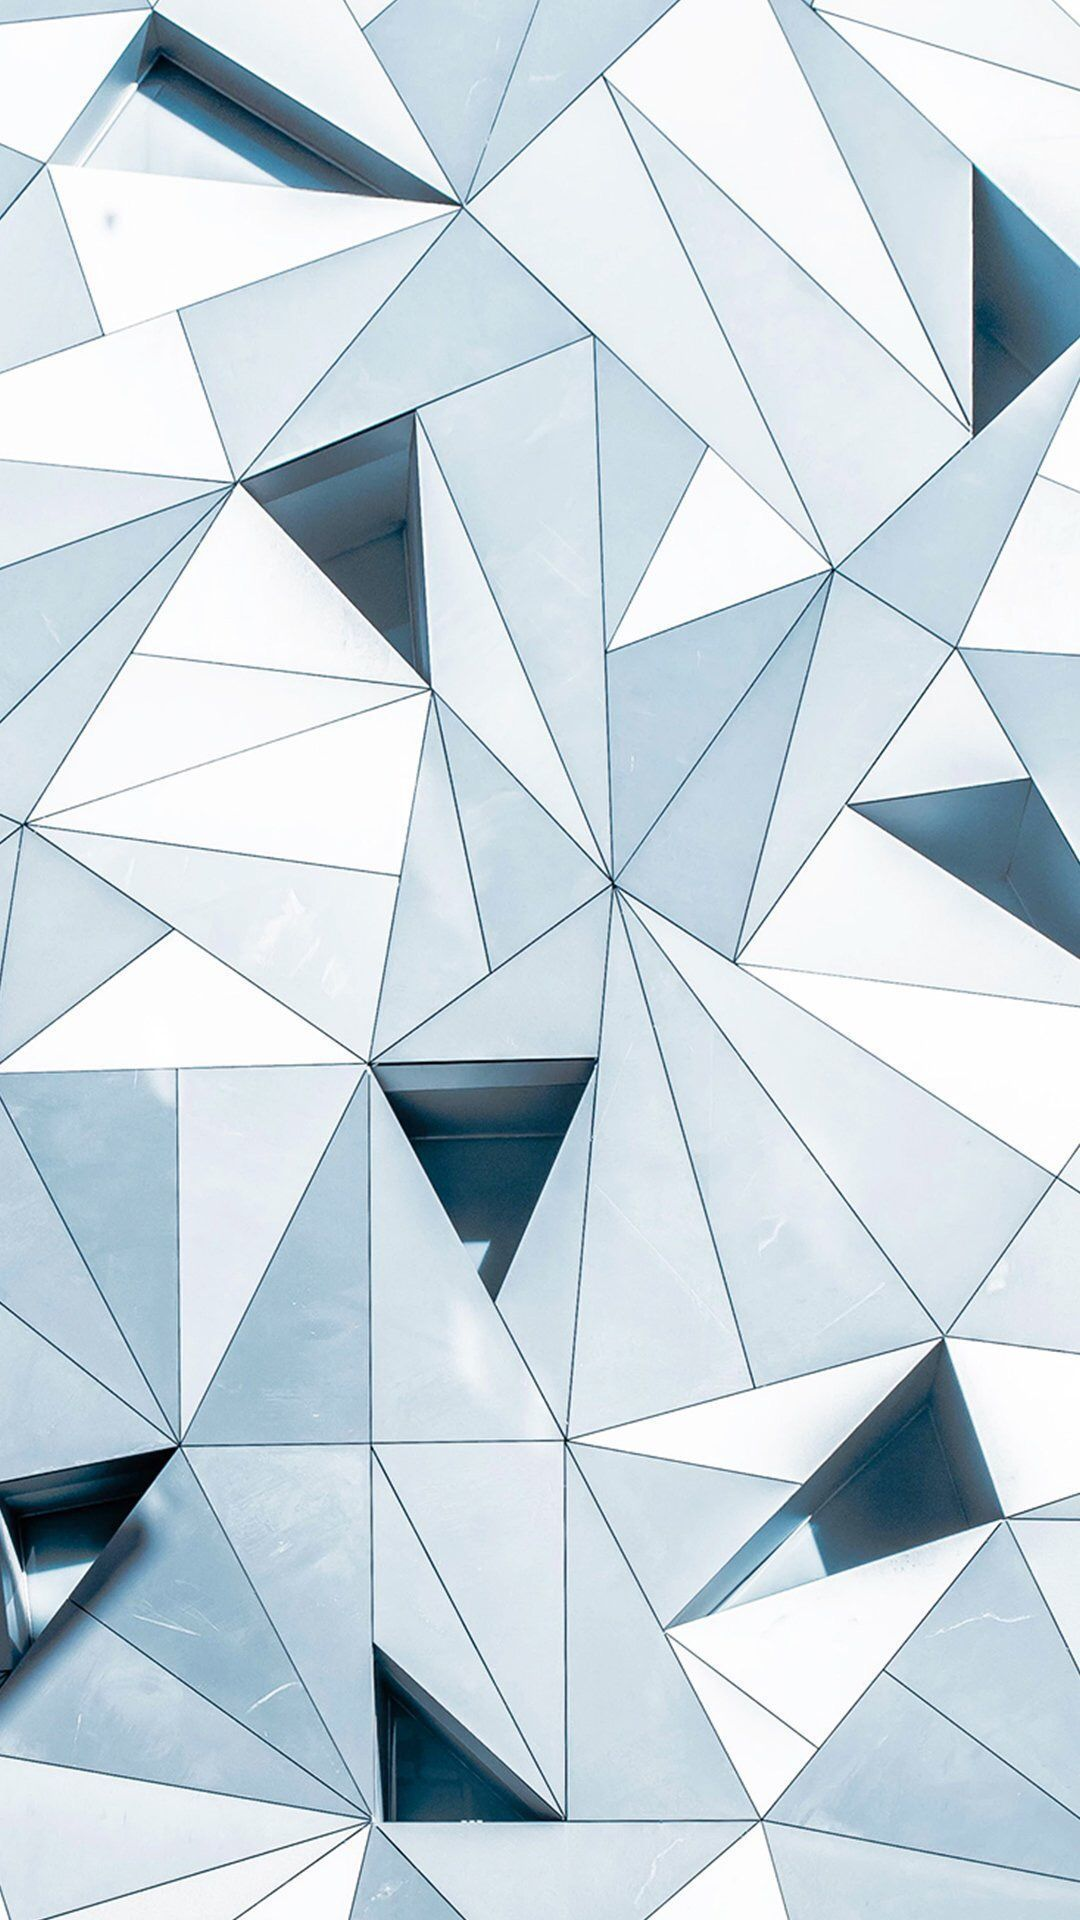 Cute Blue Pattern Background Picture Geometric Wallpaper Iphone Geometric Wallpaper Blue Geometric Wallpaper